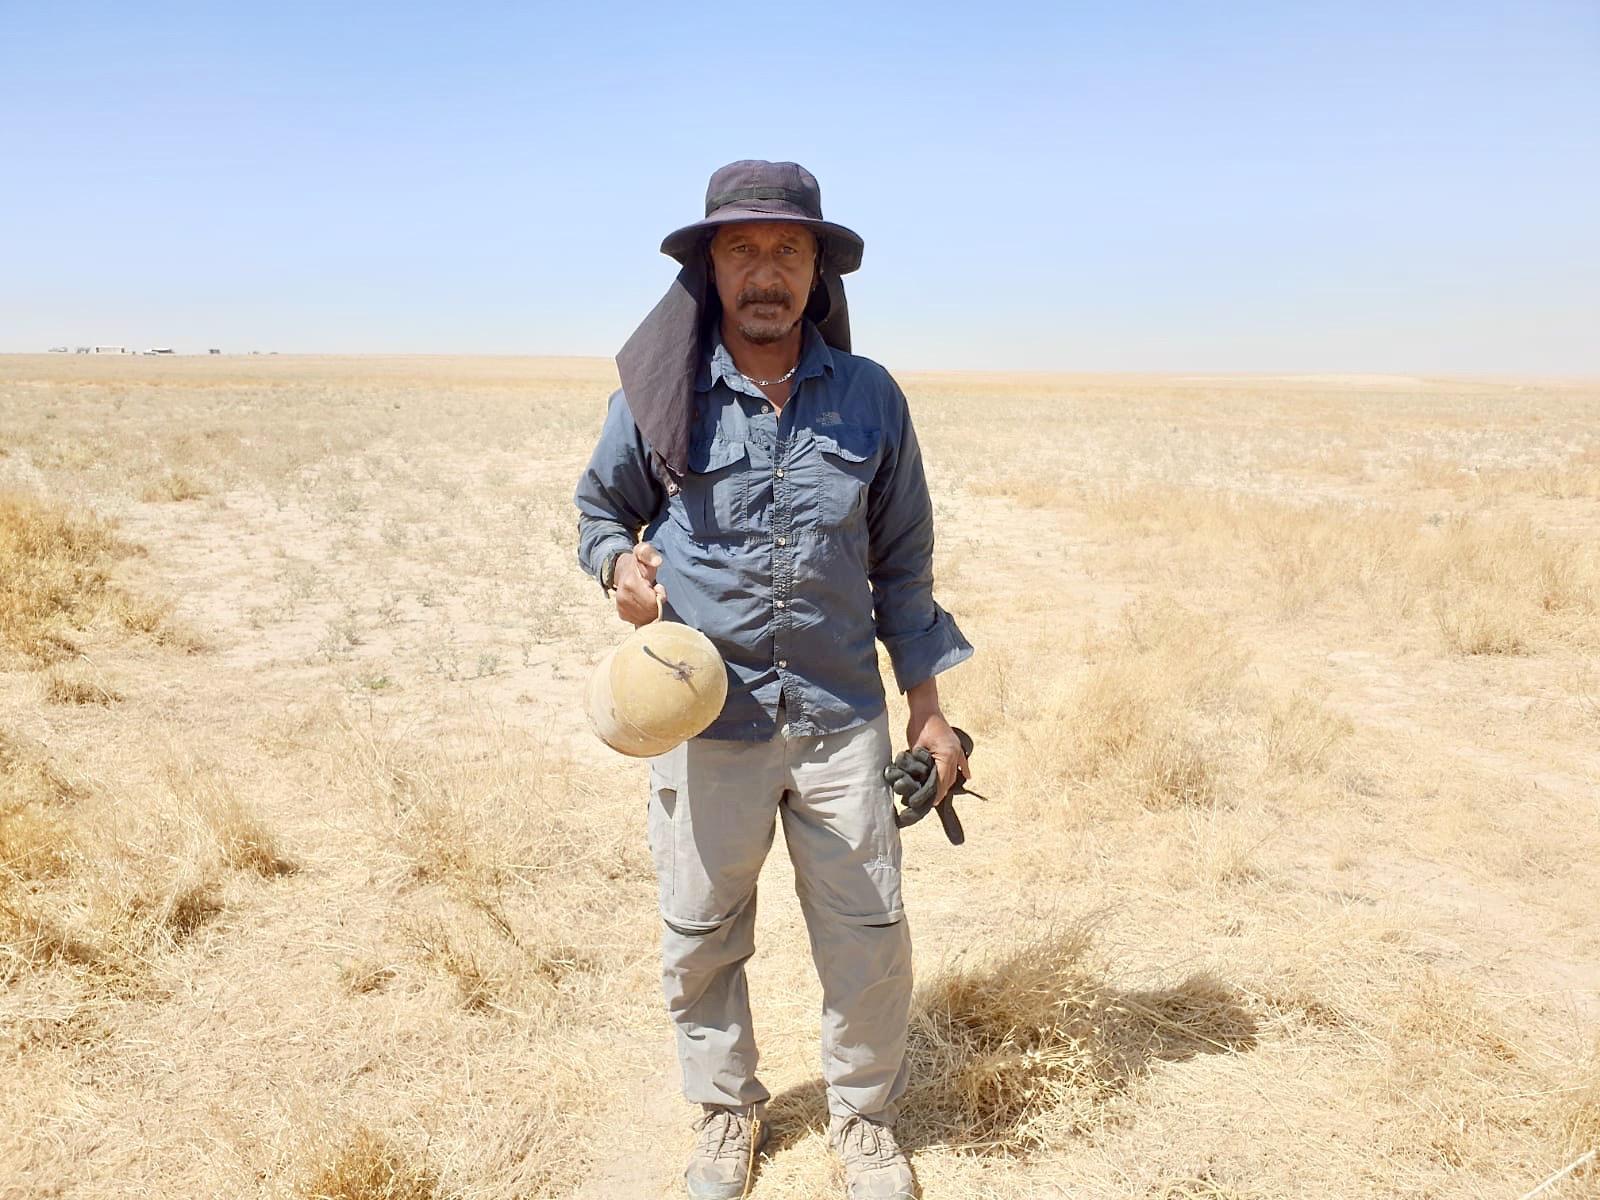 Meet Paul, The Singaporean Who Cleared Taliban Landmines In Afghanistan